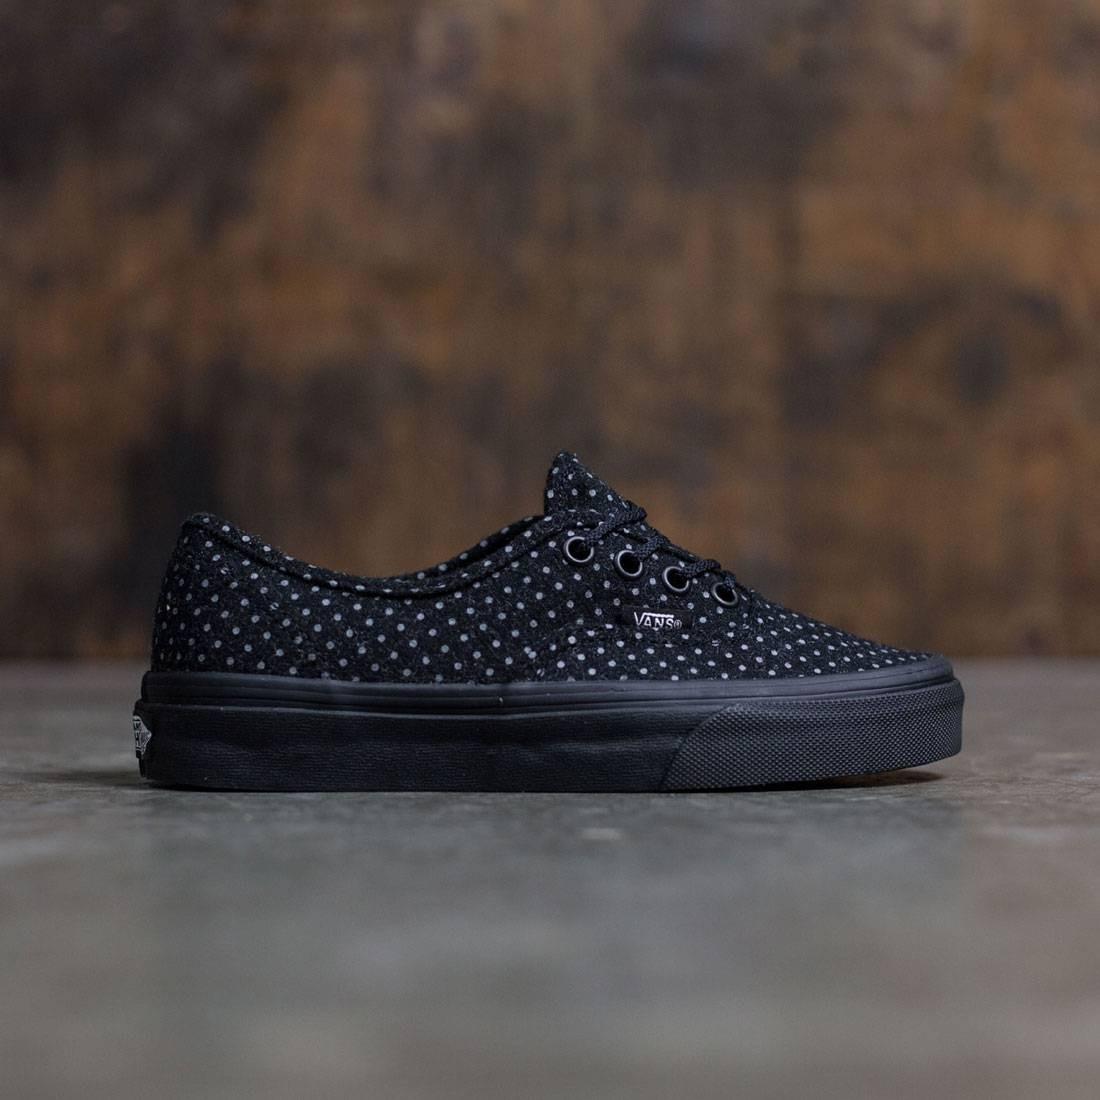 Vans Women Authentic black polka dot